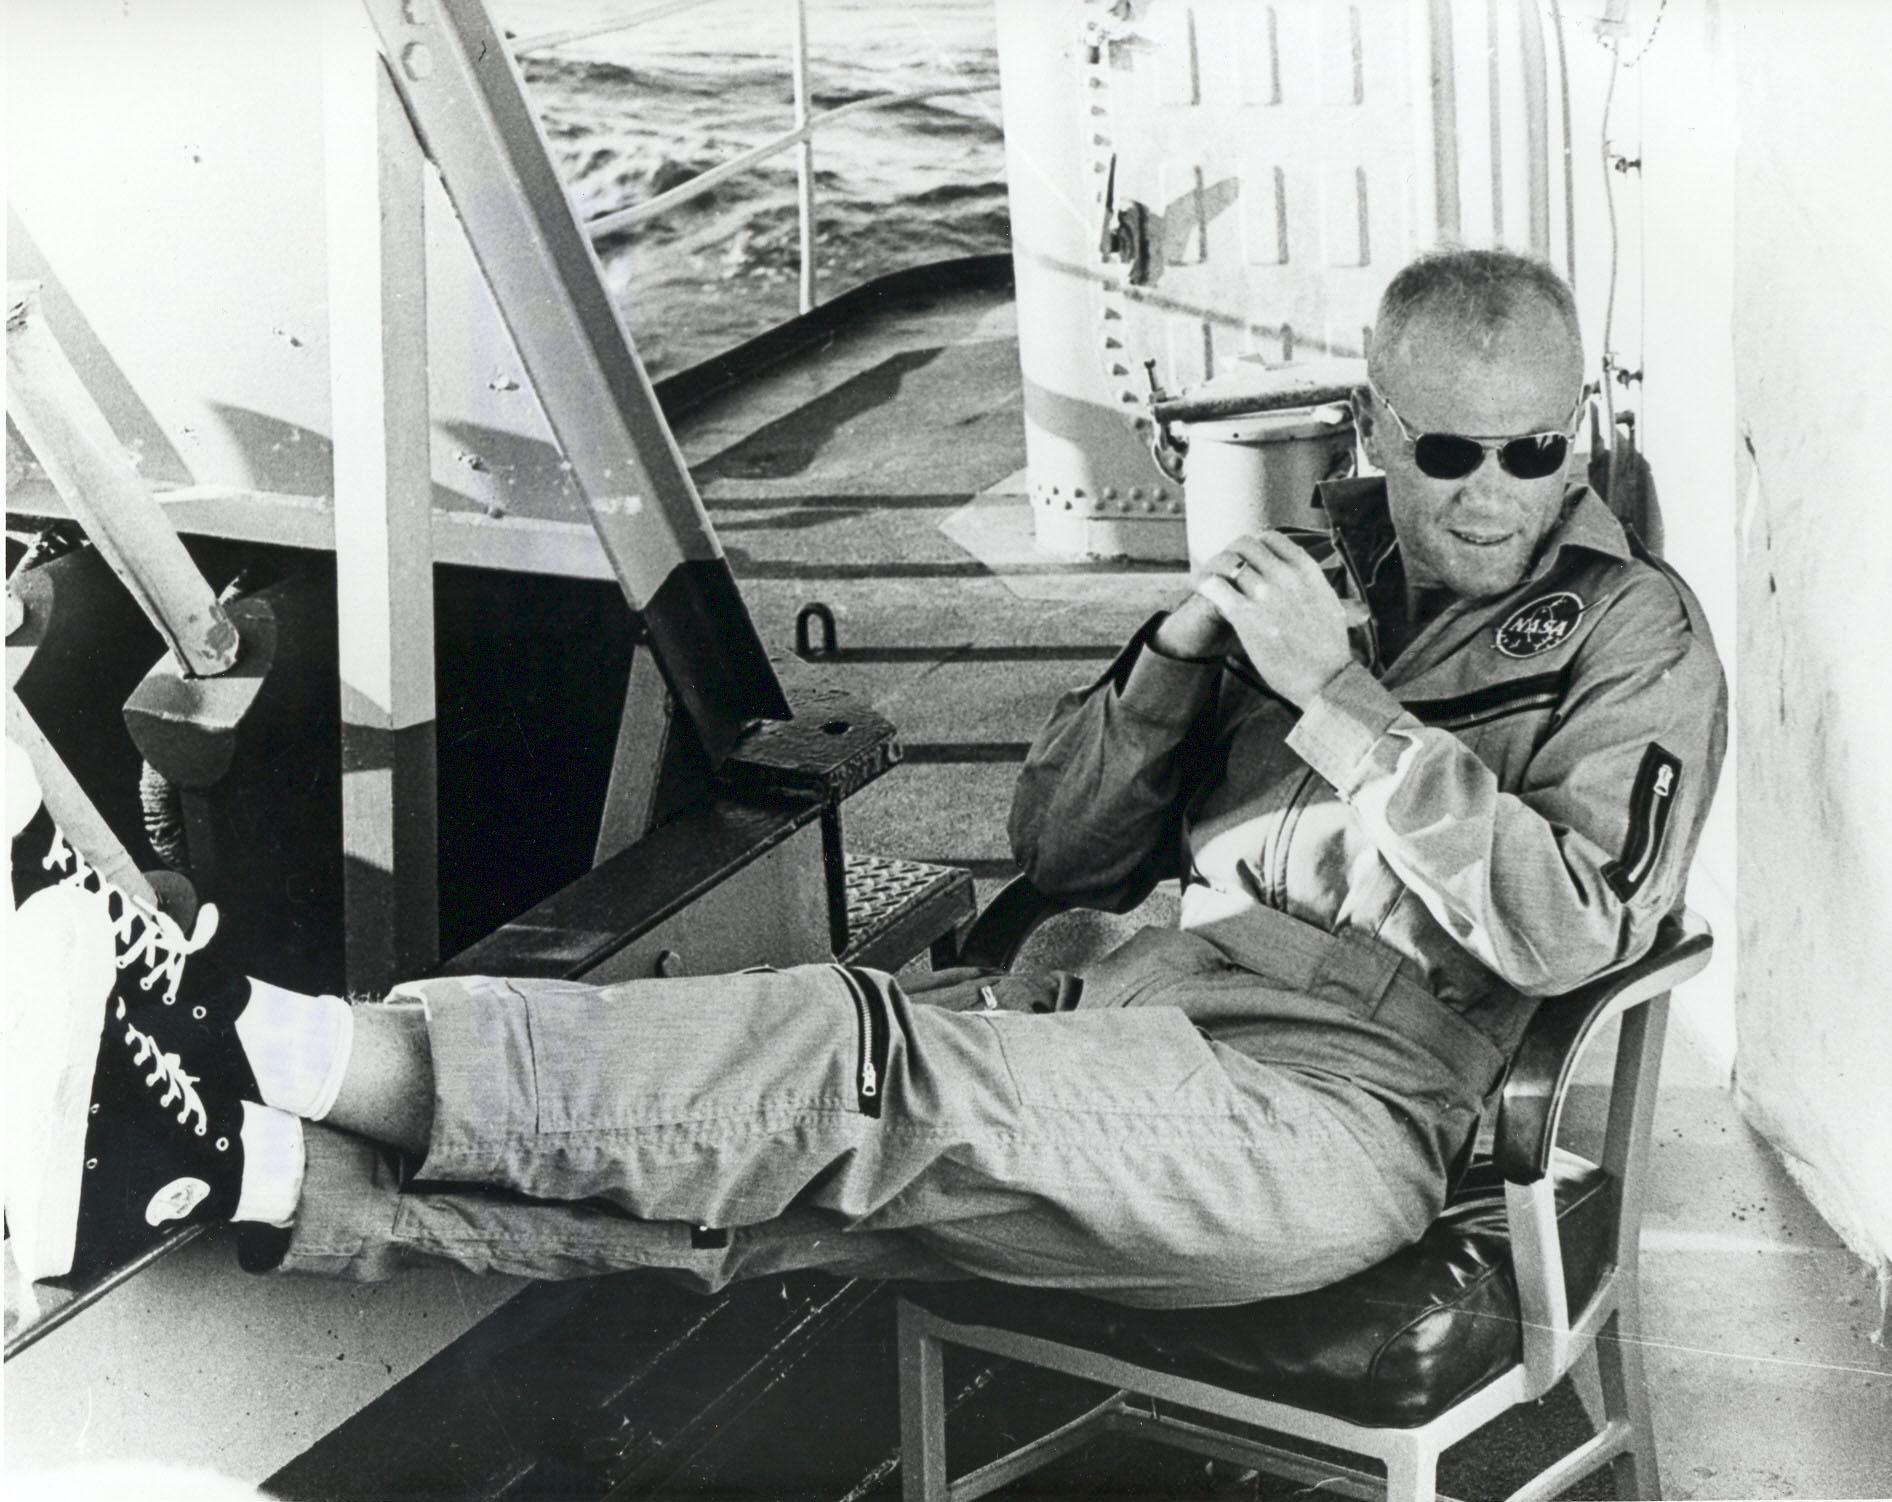 John Glenn wearing a flight suit and Converse